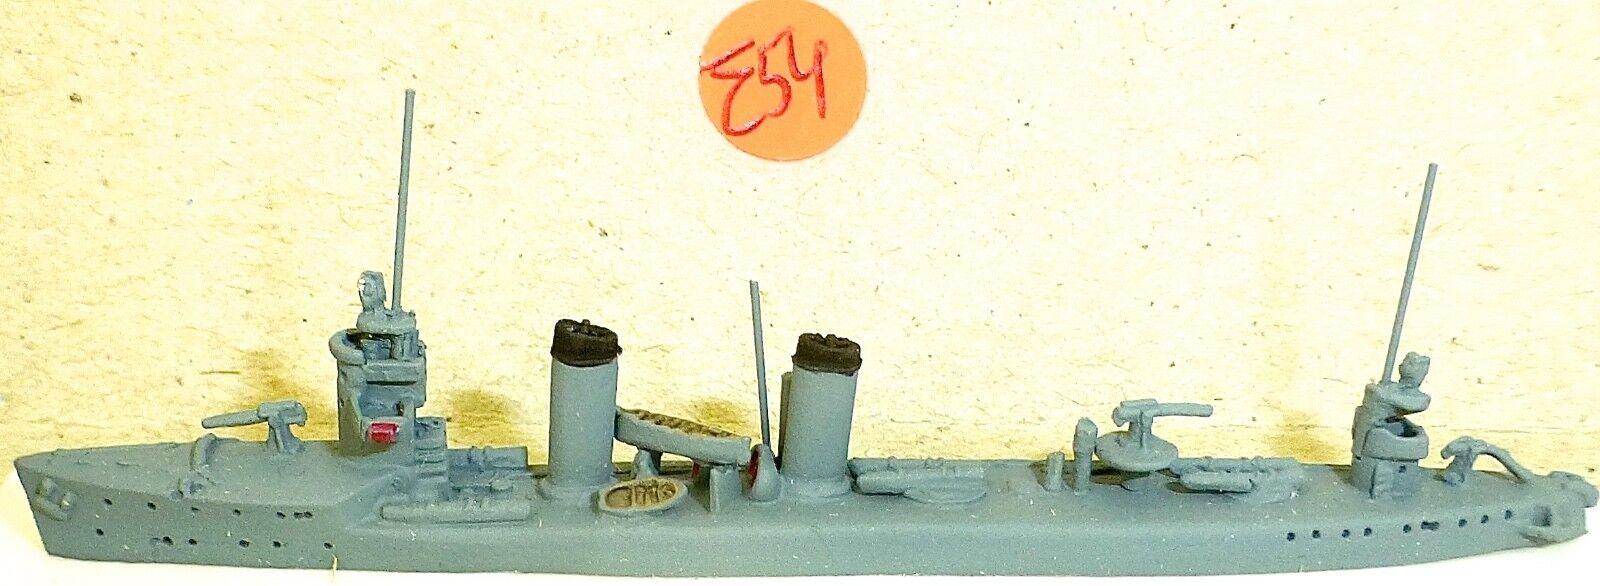 Gr Torpediniere Navis Navis Navis G85 Modello Barca 1 1250 Shp ∑ 54 Å 59b198